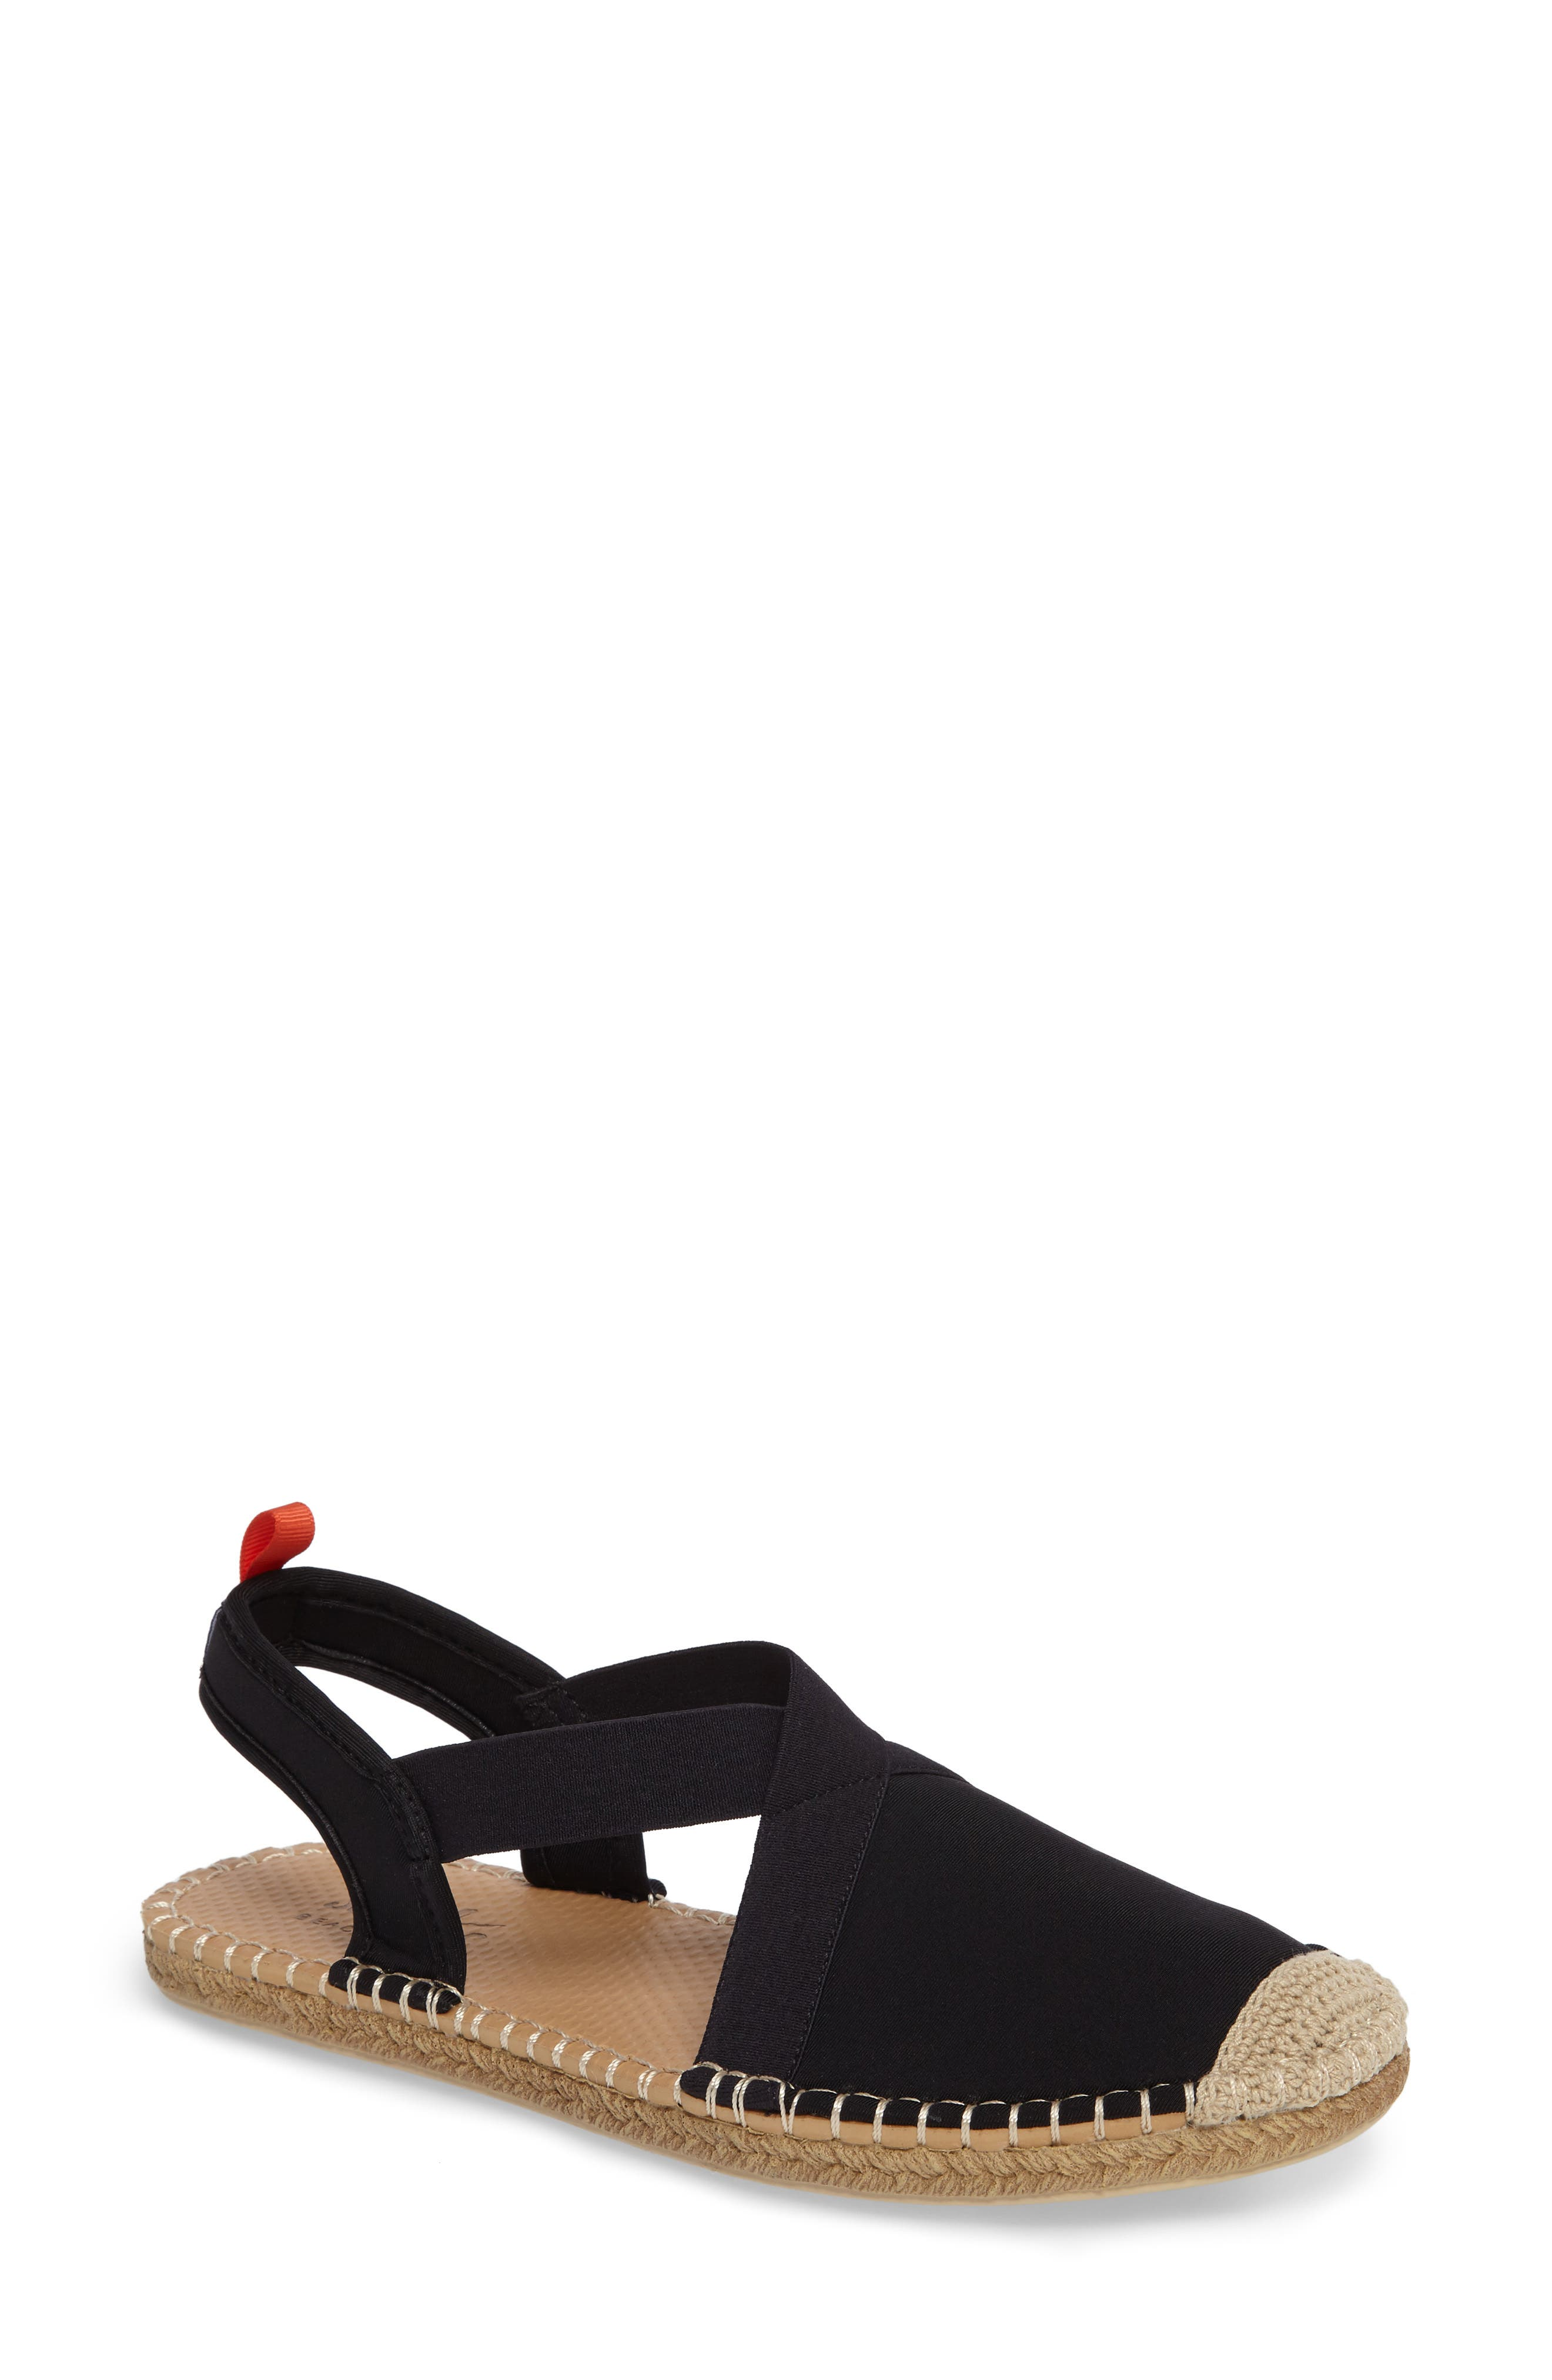 Alternate Image 1 Selected - Sea Star Slingback Espadrille Water Shoe (Women)